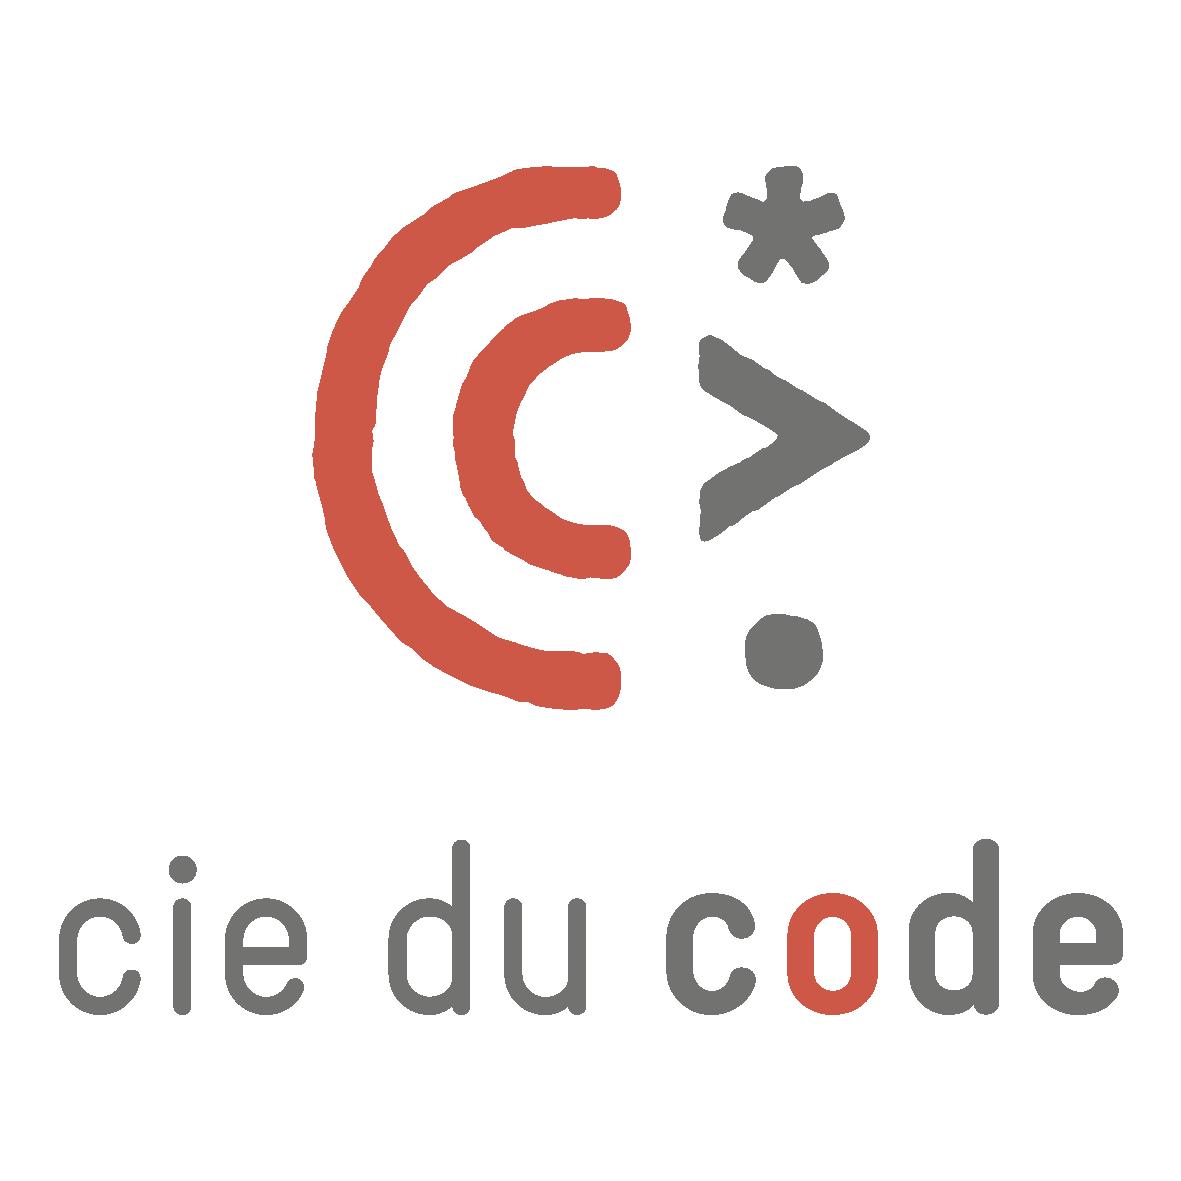 Ciecode